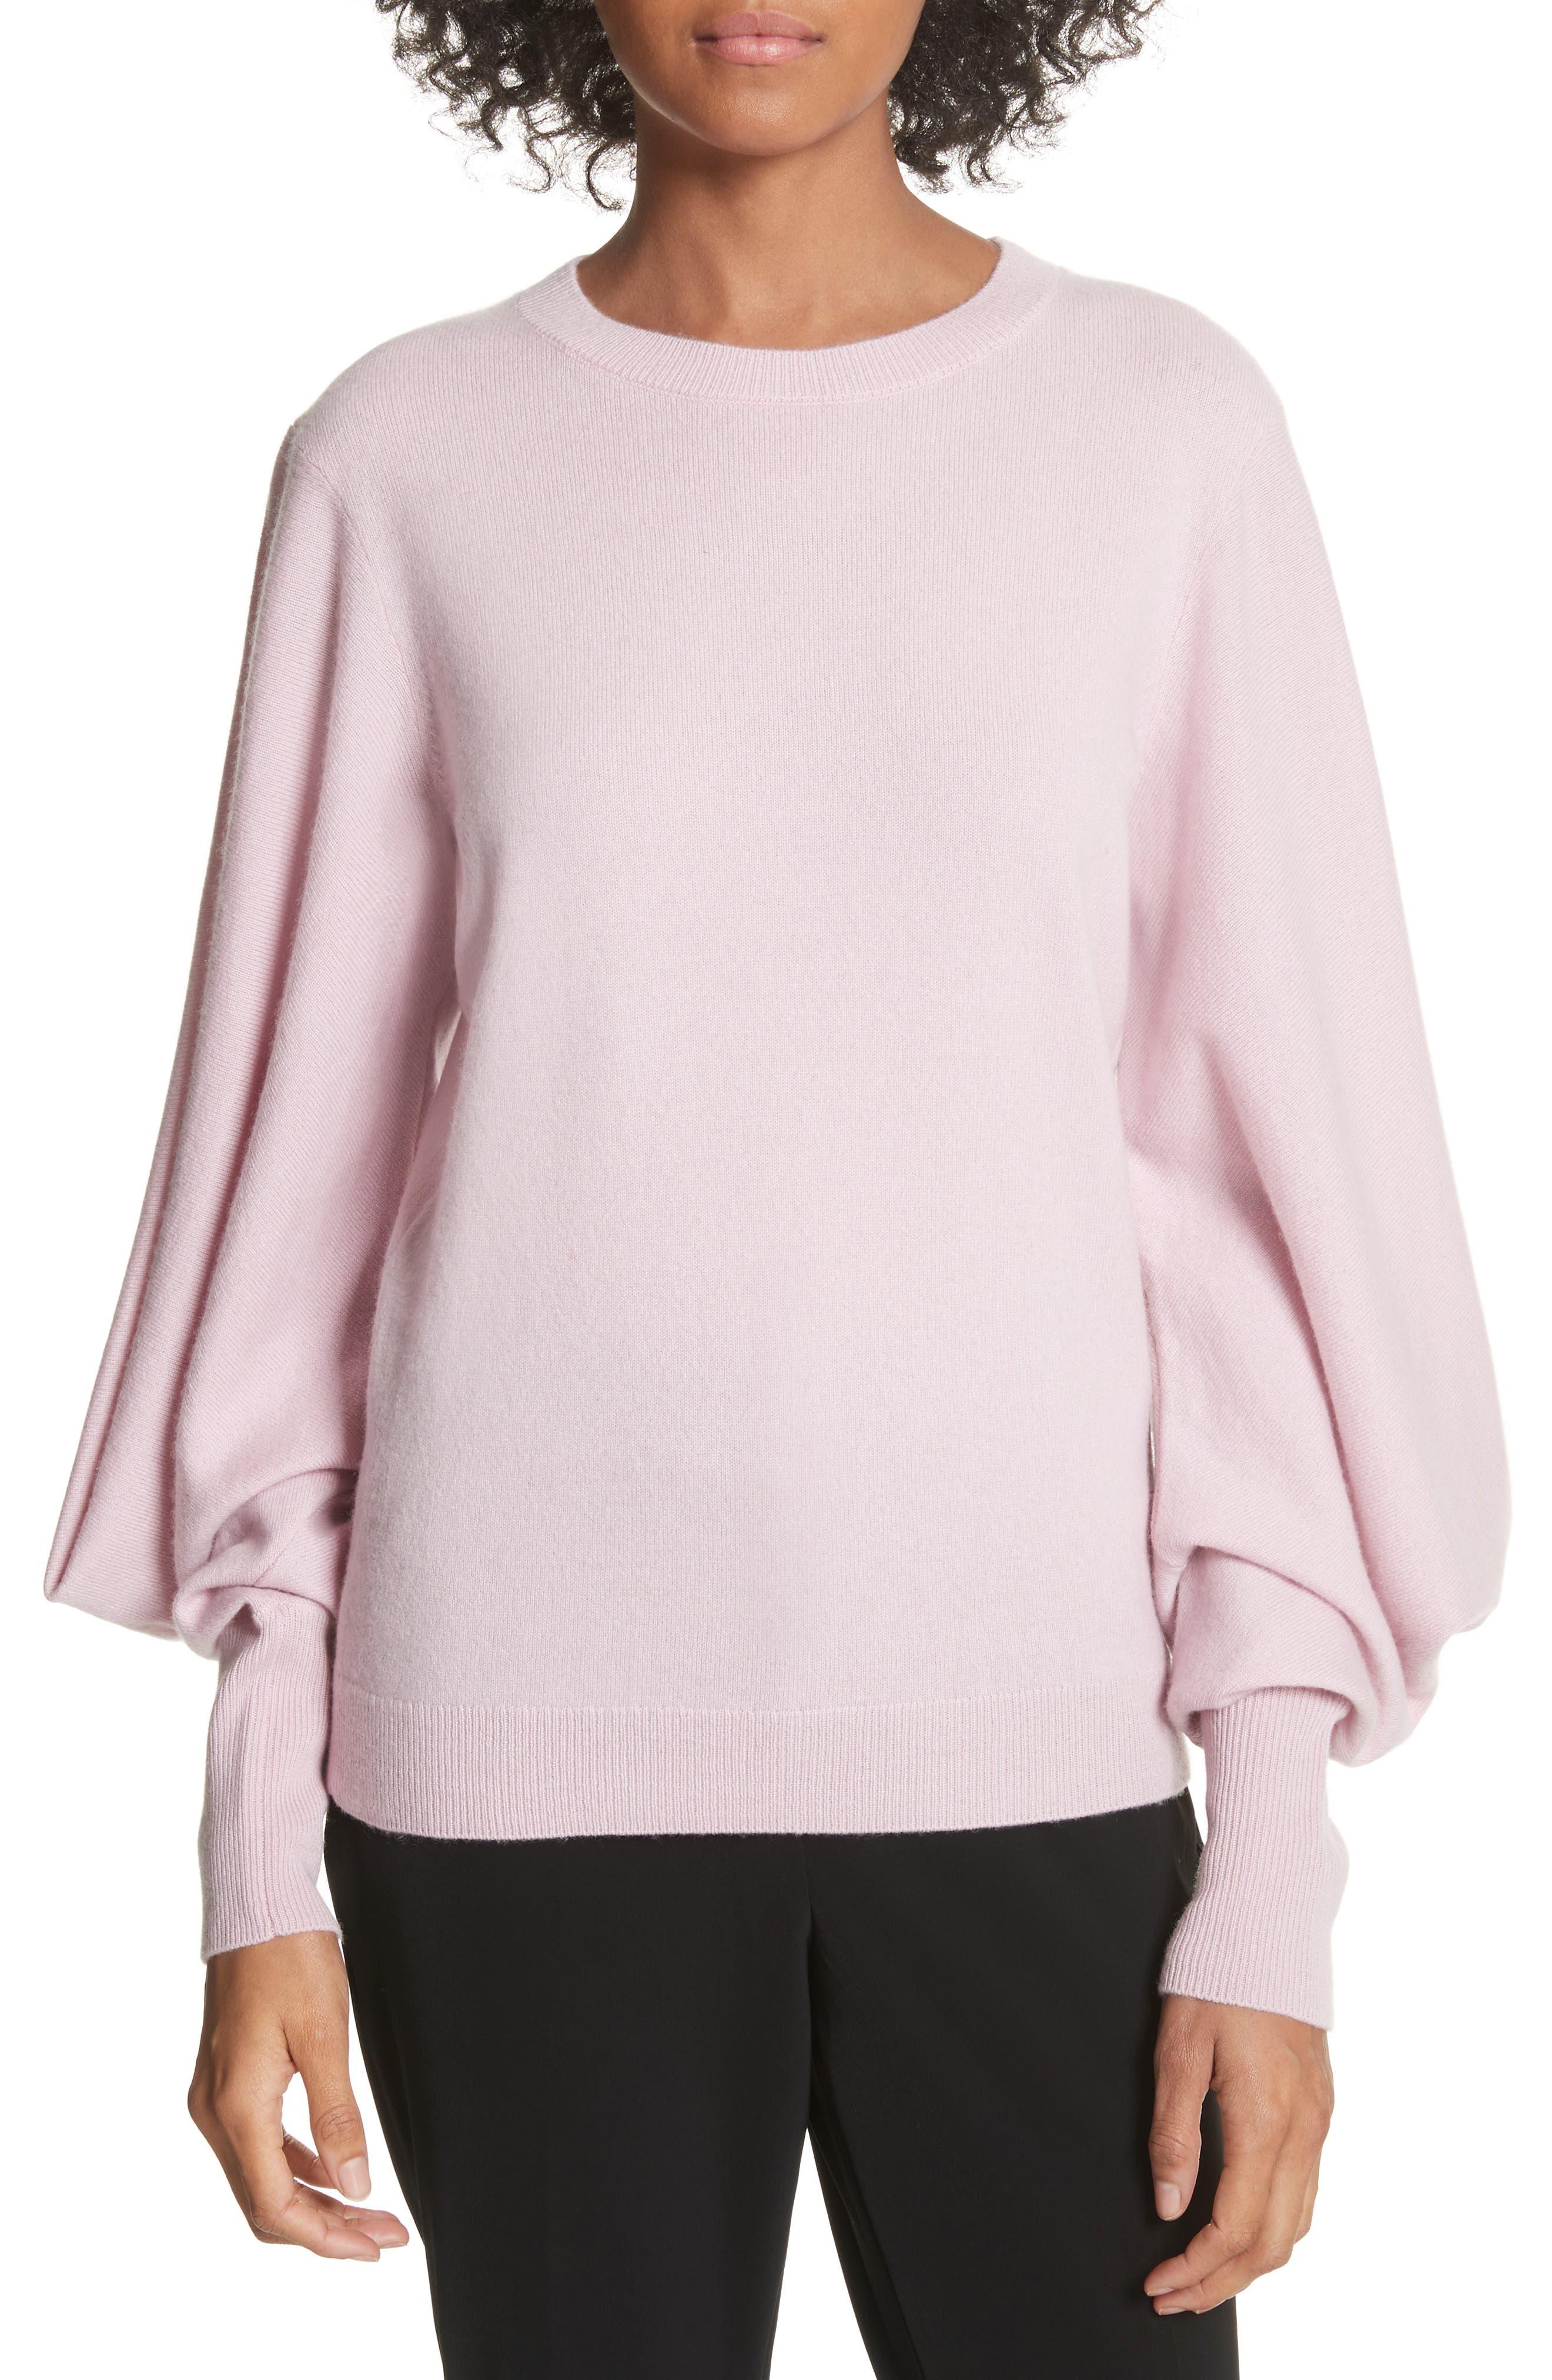 Fluri Cashmere Sweater,                             Main thumbnail 1, color,                             Light Pink